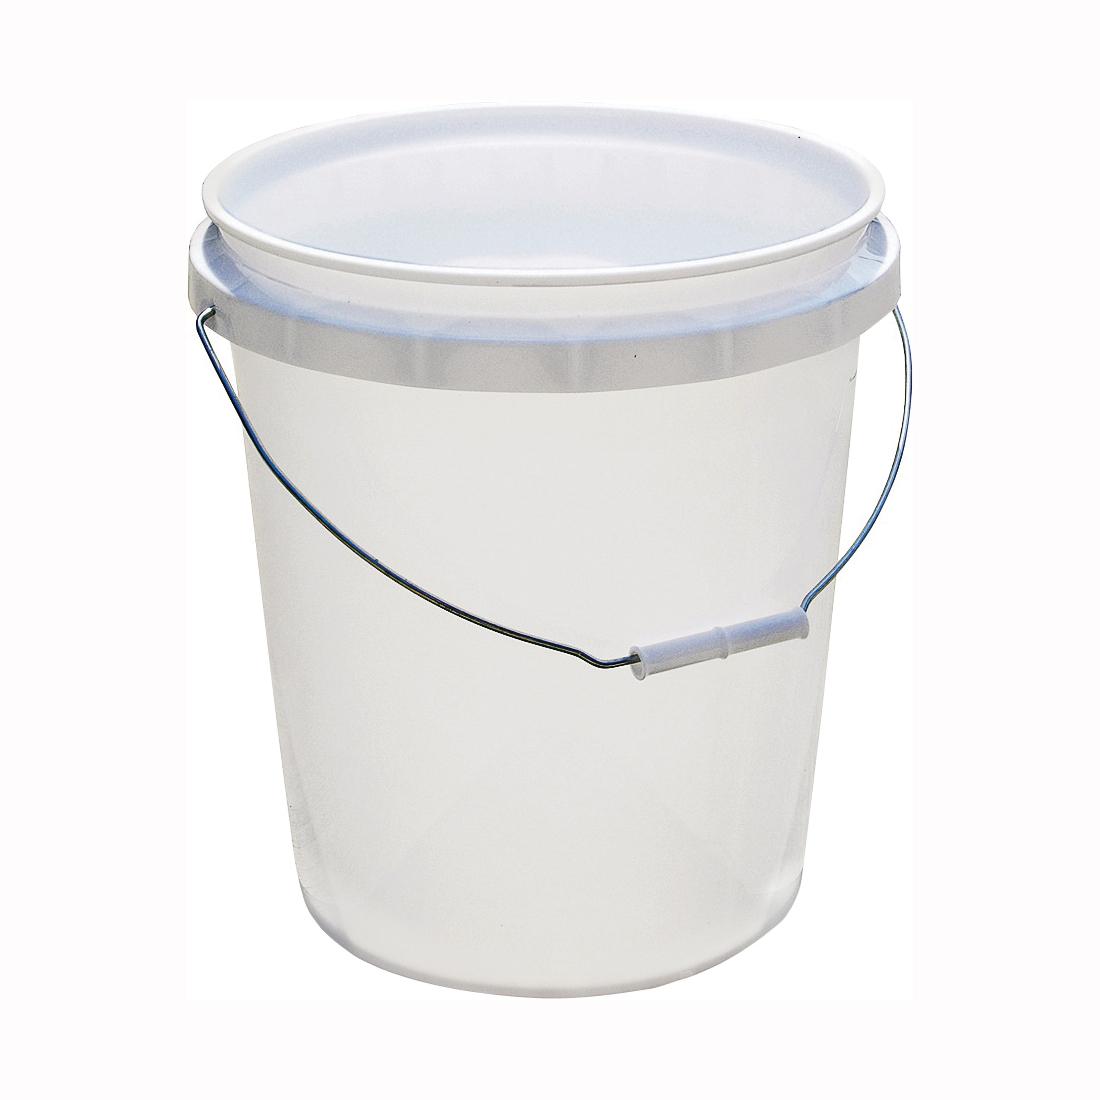 Picture of ENCORE Plastics 50640 Paint Pail, 5 gal Capacity, HDPE, White